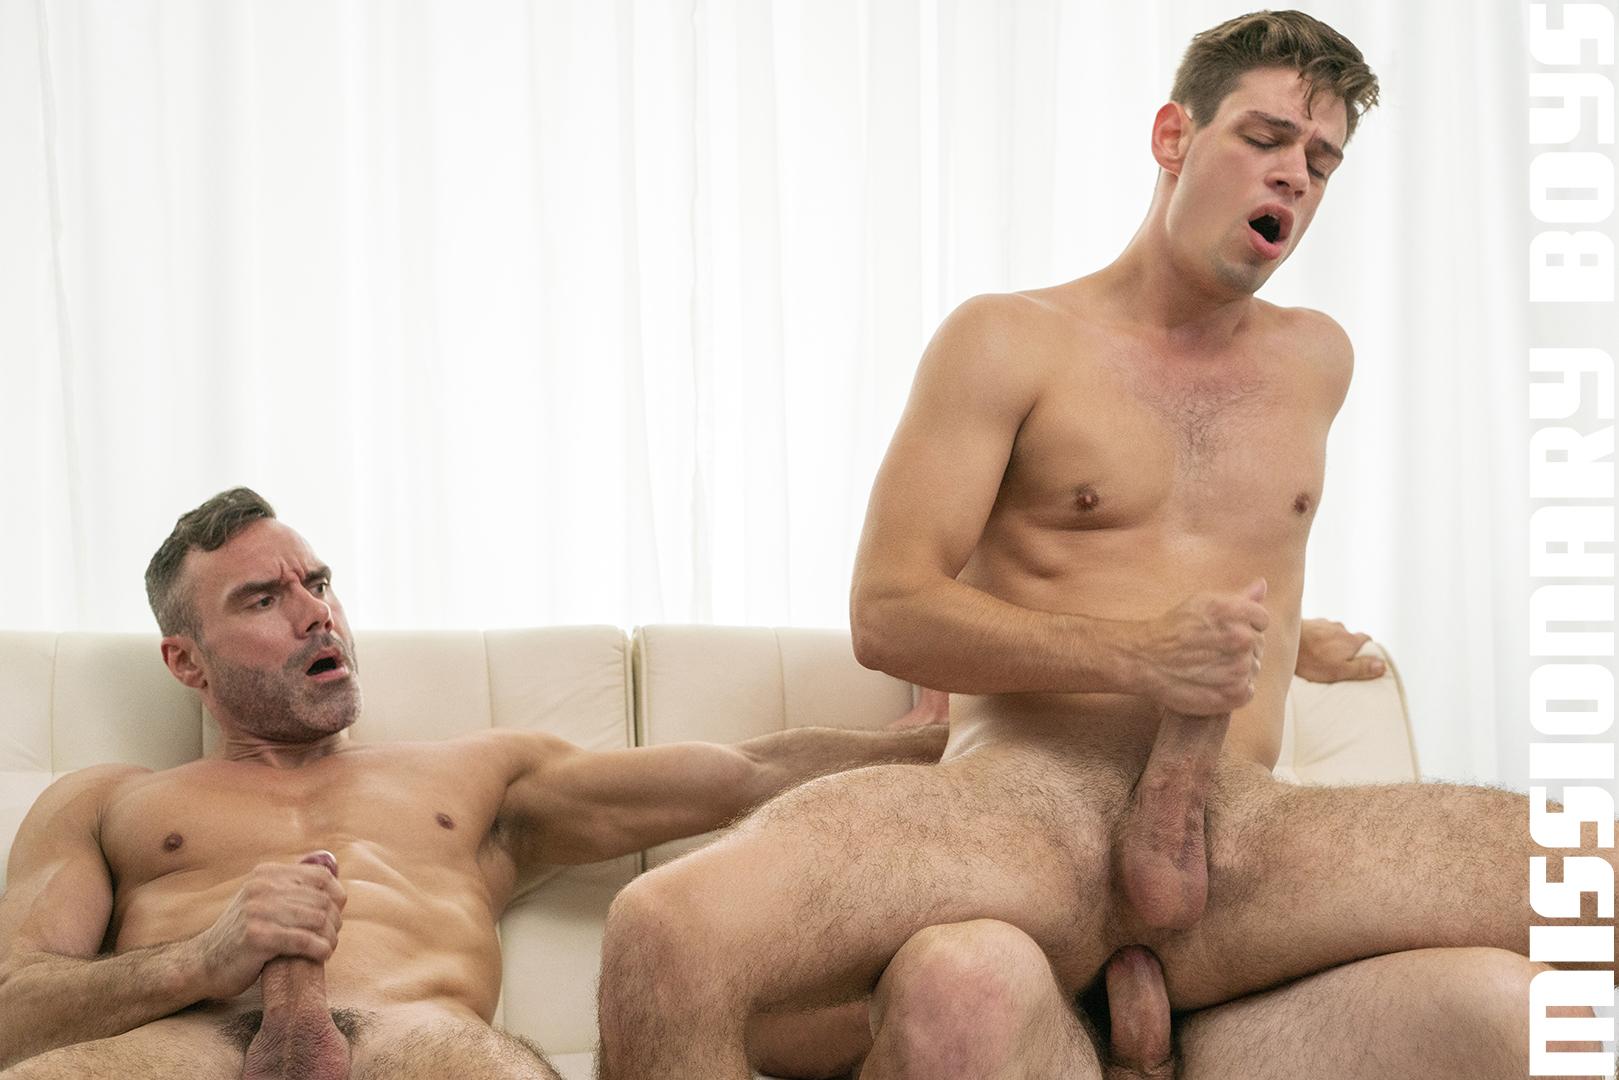 180828_mbz_06-missionaryboys-gay-daddy-son-sex_pic16